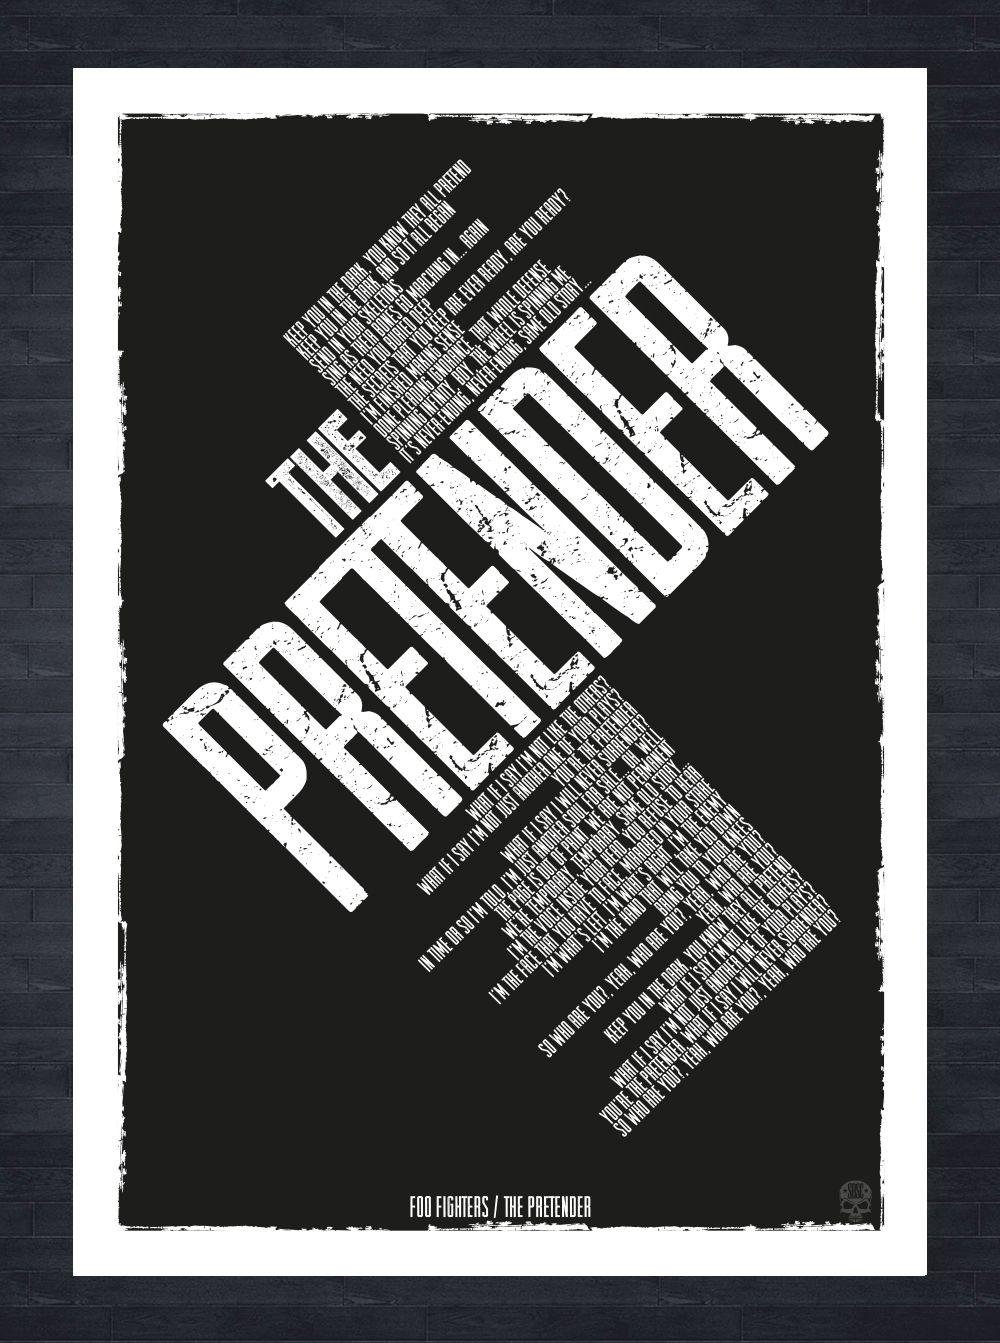 Foo Fighters The Pretender song lyrics A3 print. Created in Adobe Illustrator vector artwork.   Foo fighters lyrics. Foo fighters. Foo fighters ...